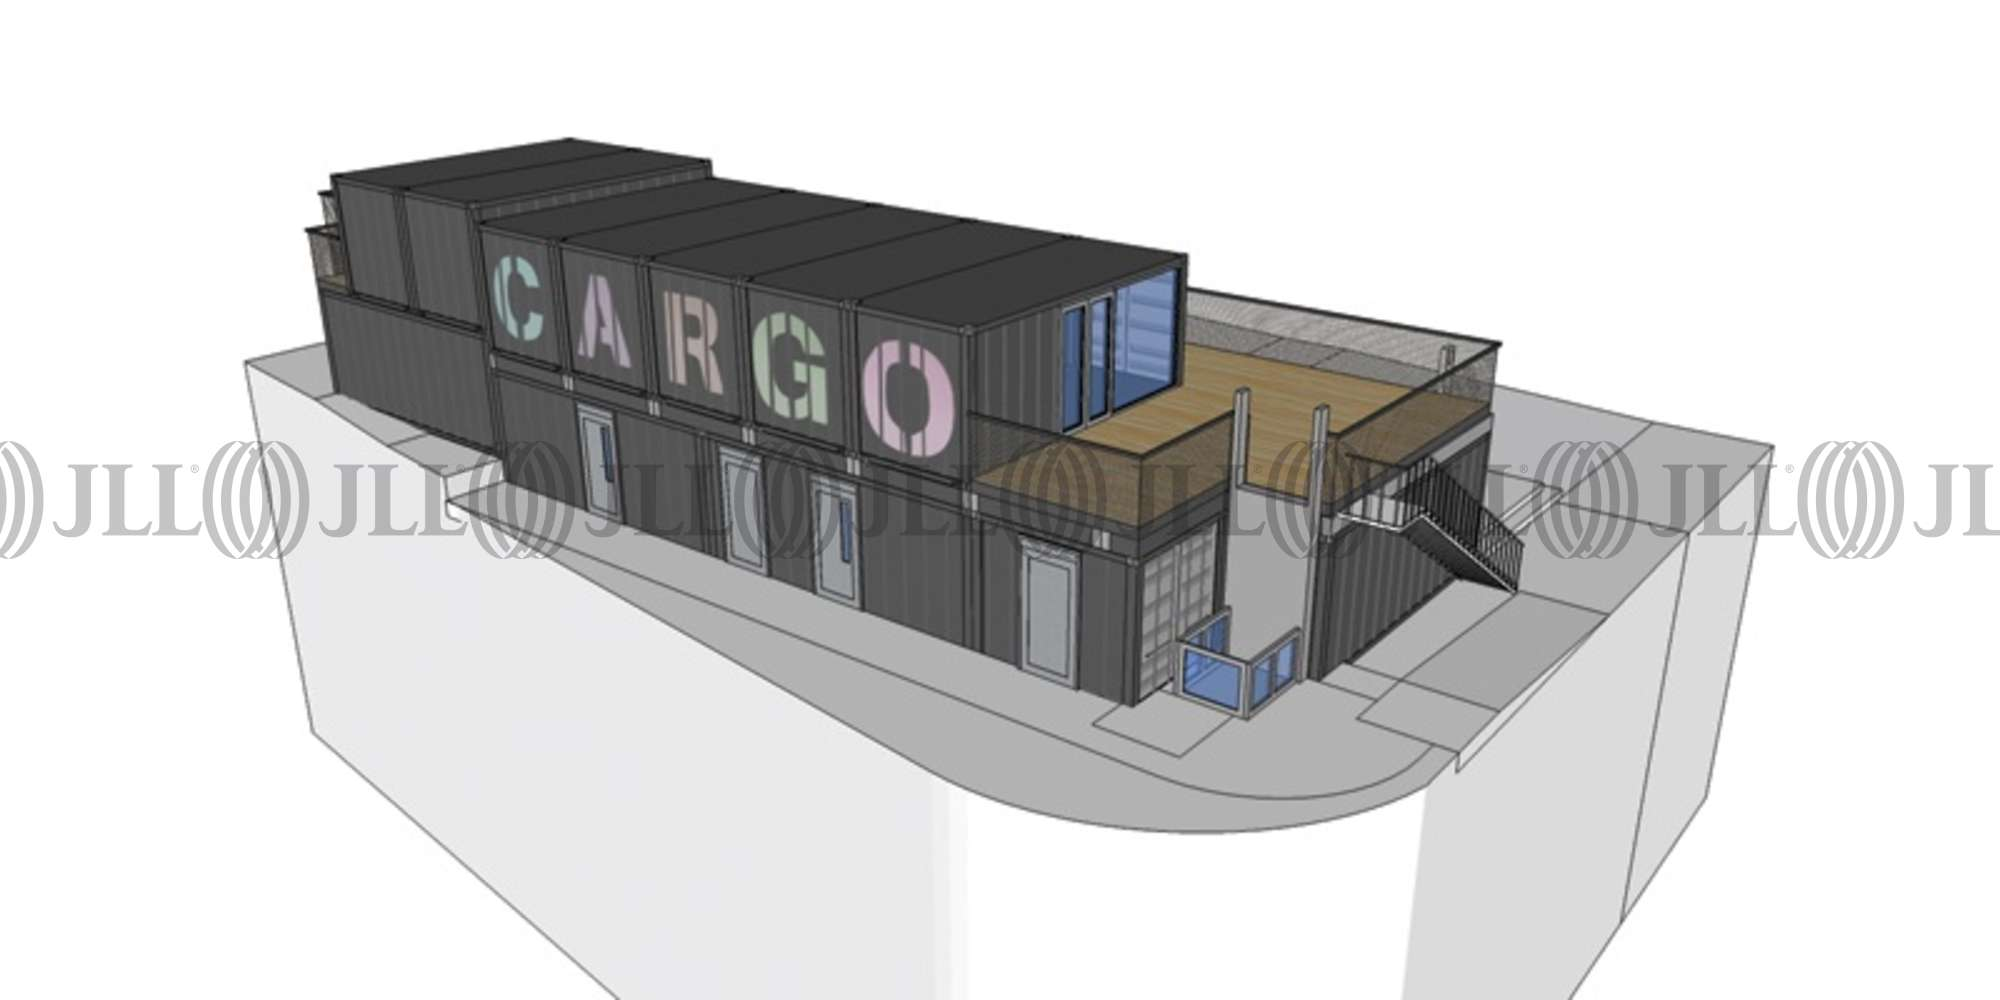 Retail high street Bristol, BS1 5WE - Cargo @ Wapping Wharf - 03